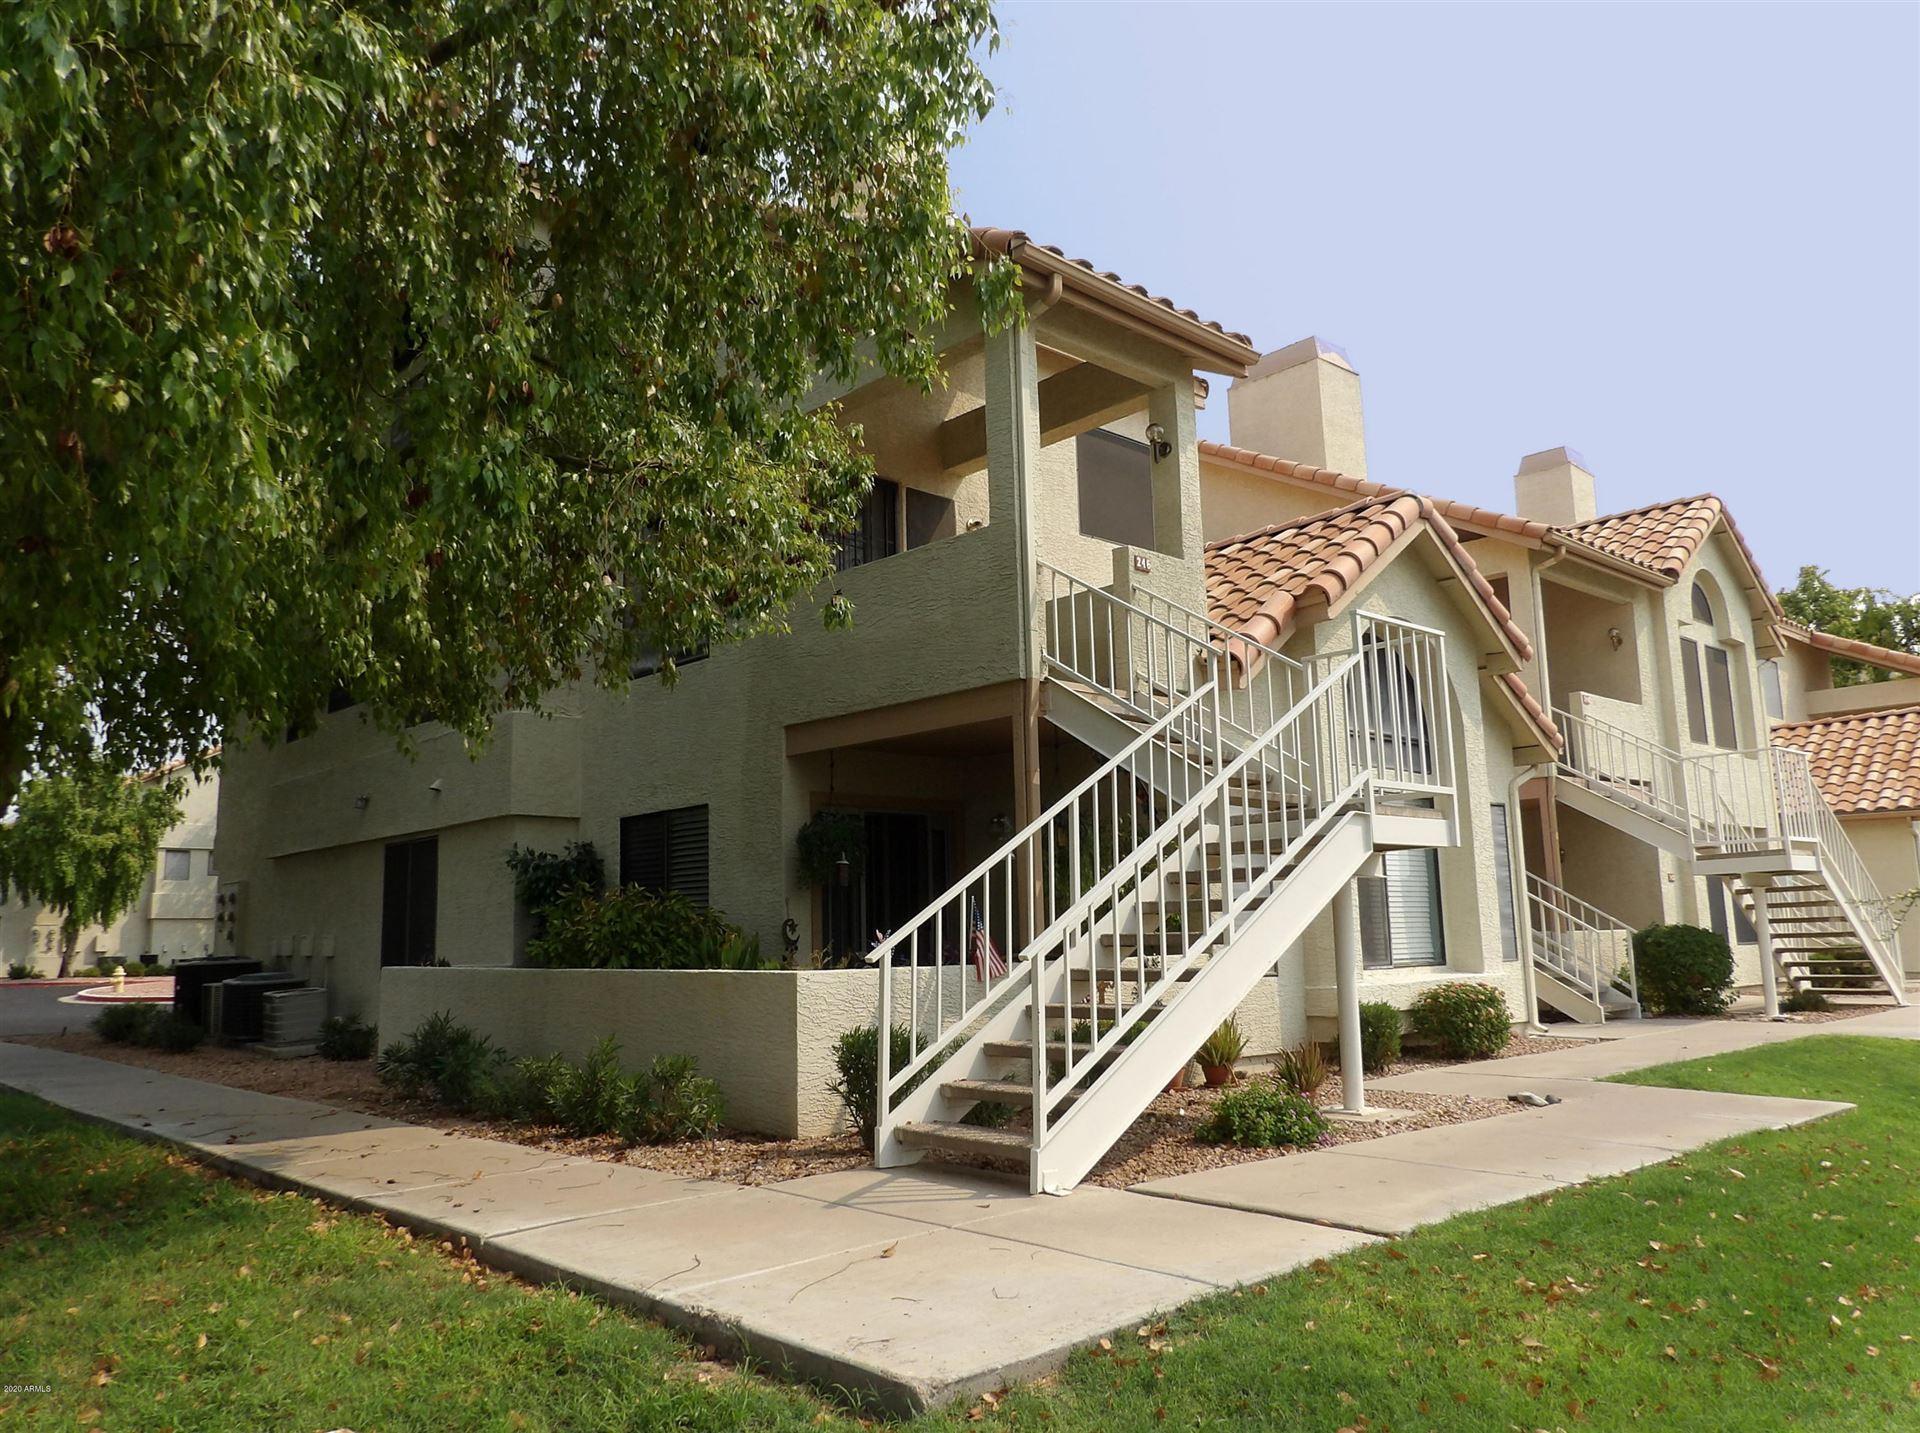 19820 N 13TH Avenue #145, Phoenix, AZ 85027 - MLS#: 6130611